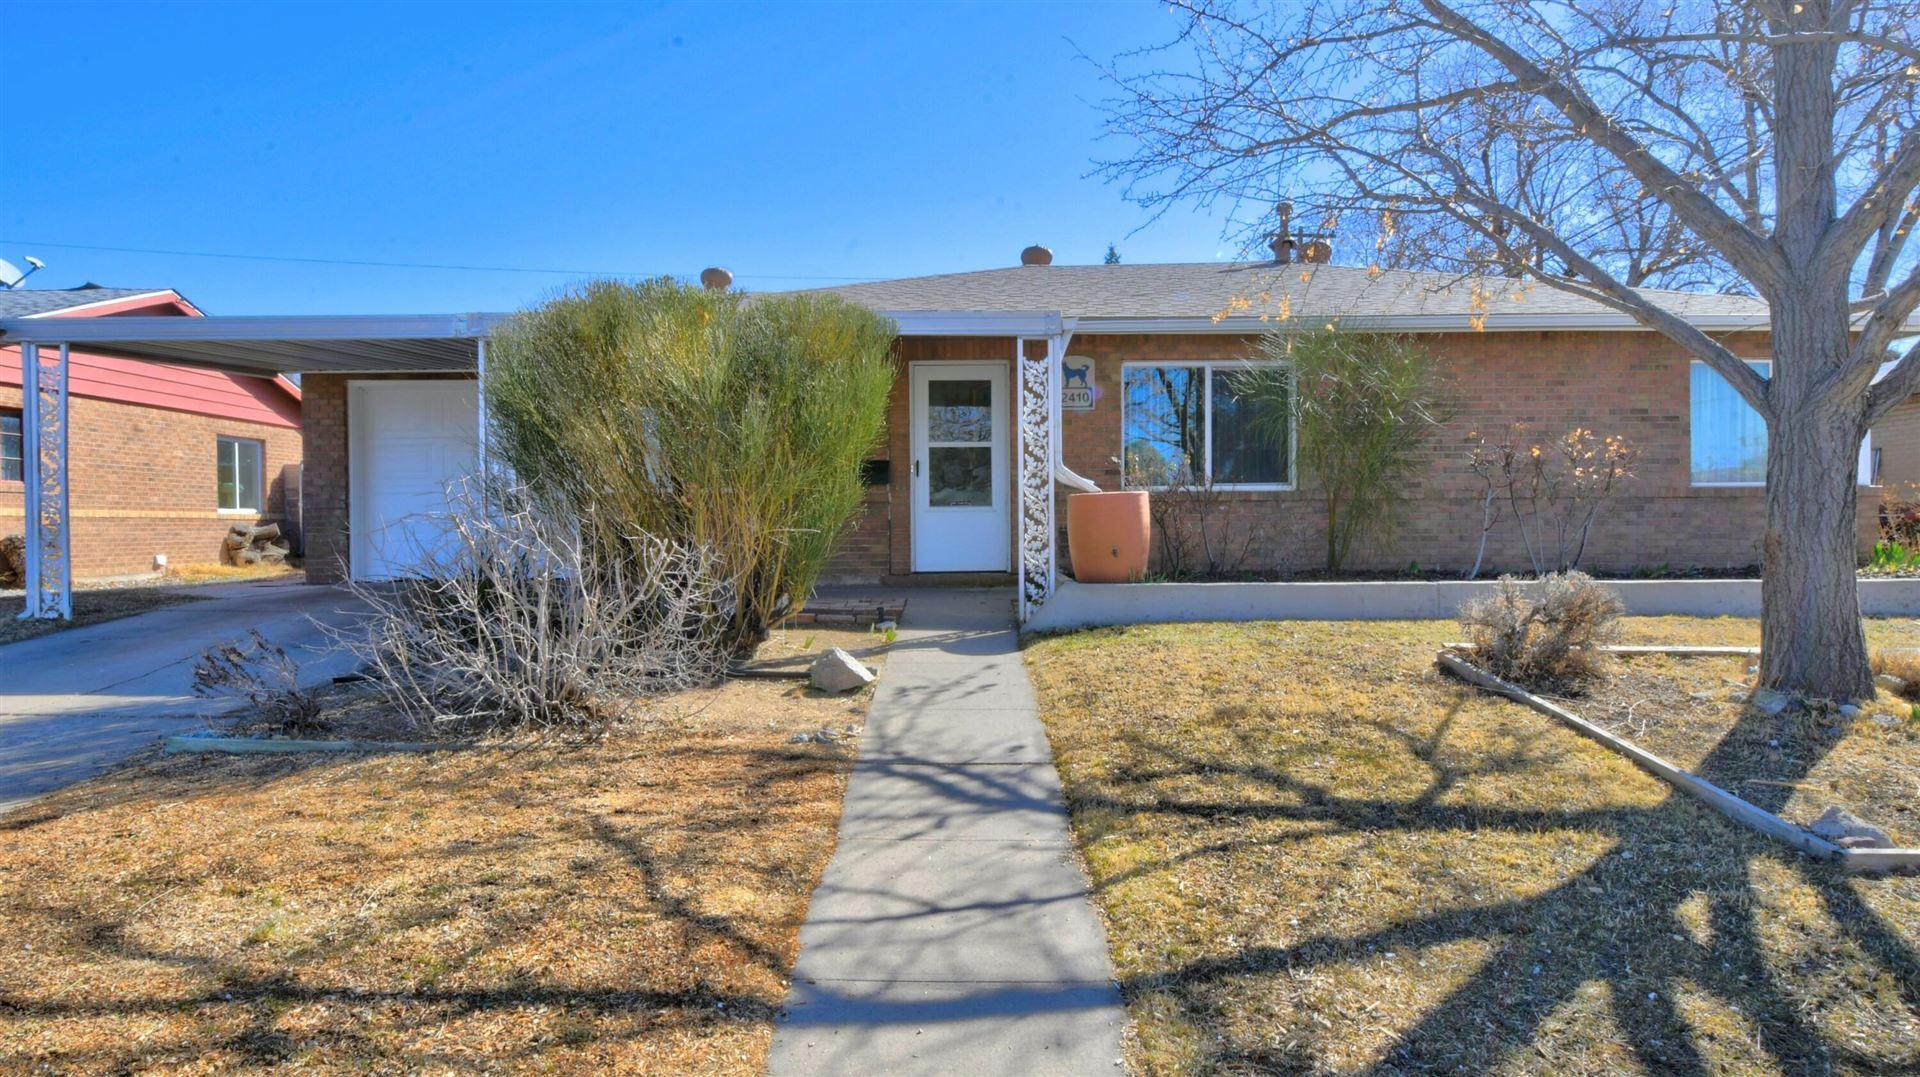 2410 GENERAL MARSHALL Street NE, Albuquerque, NM 87112 - MLS#: 986842